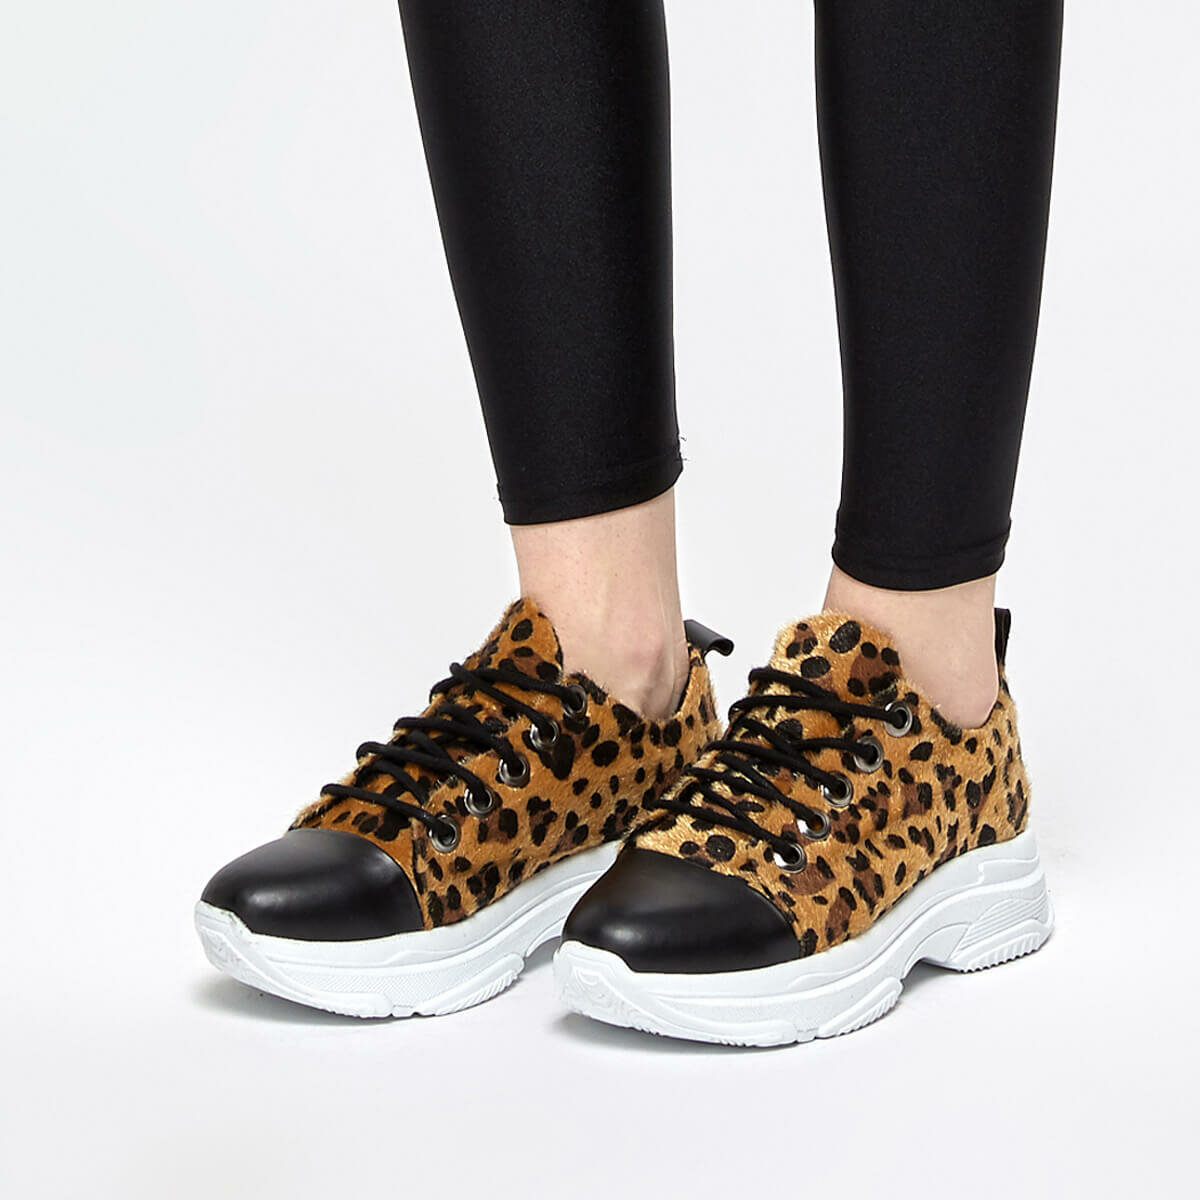 FLO FABRE89Z SUEDE Leopard Women 'S Sneaker Shoes BUTIGO